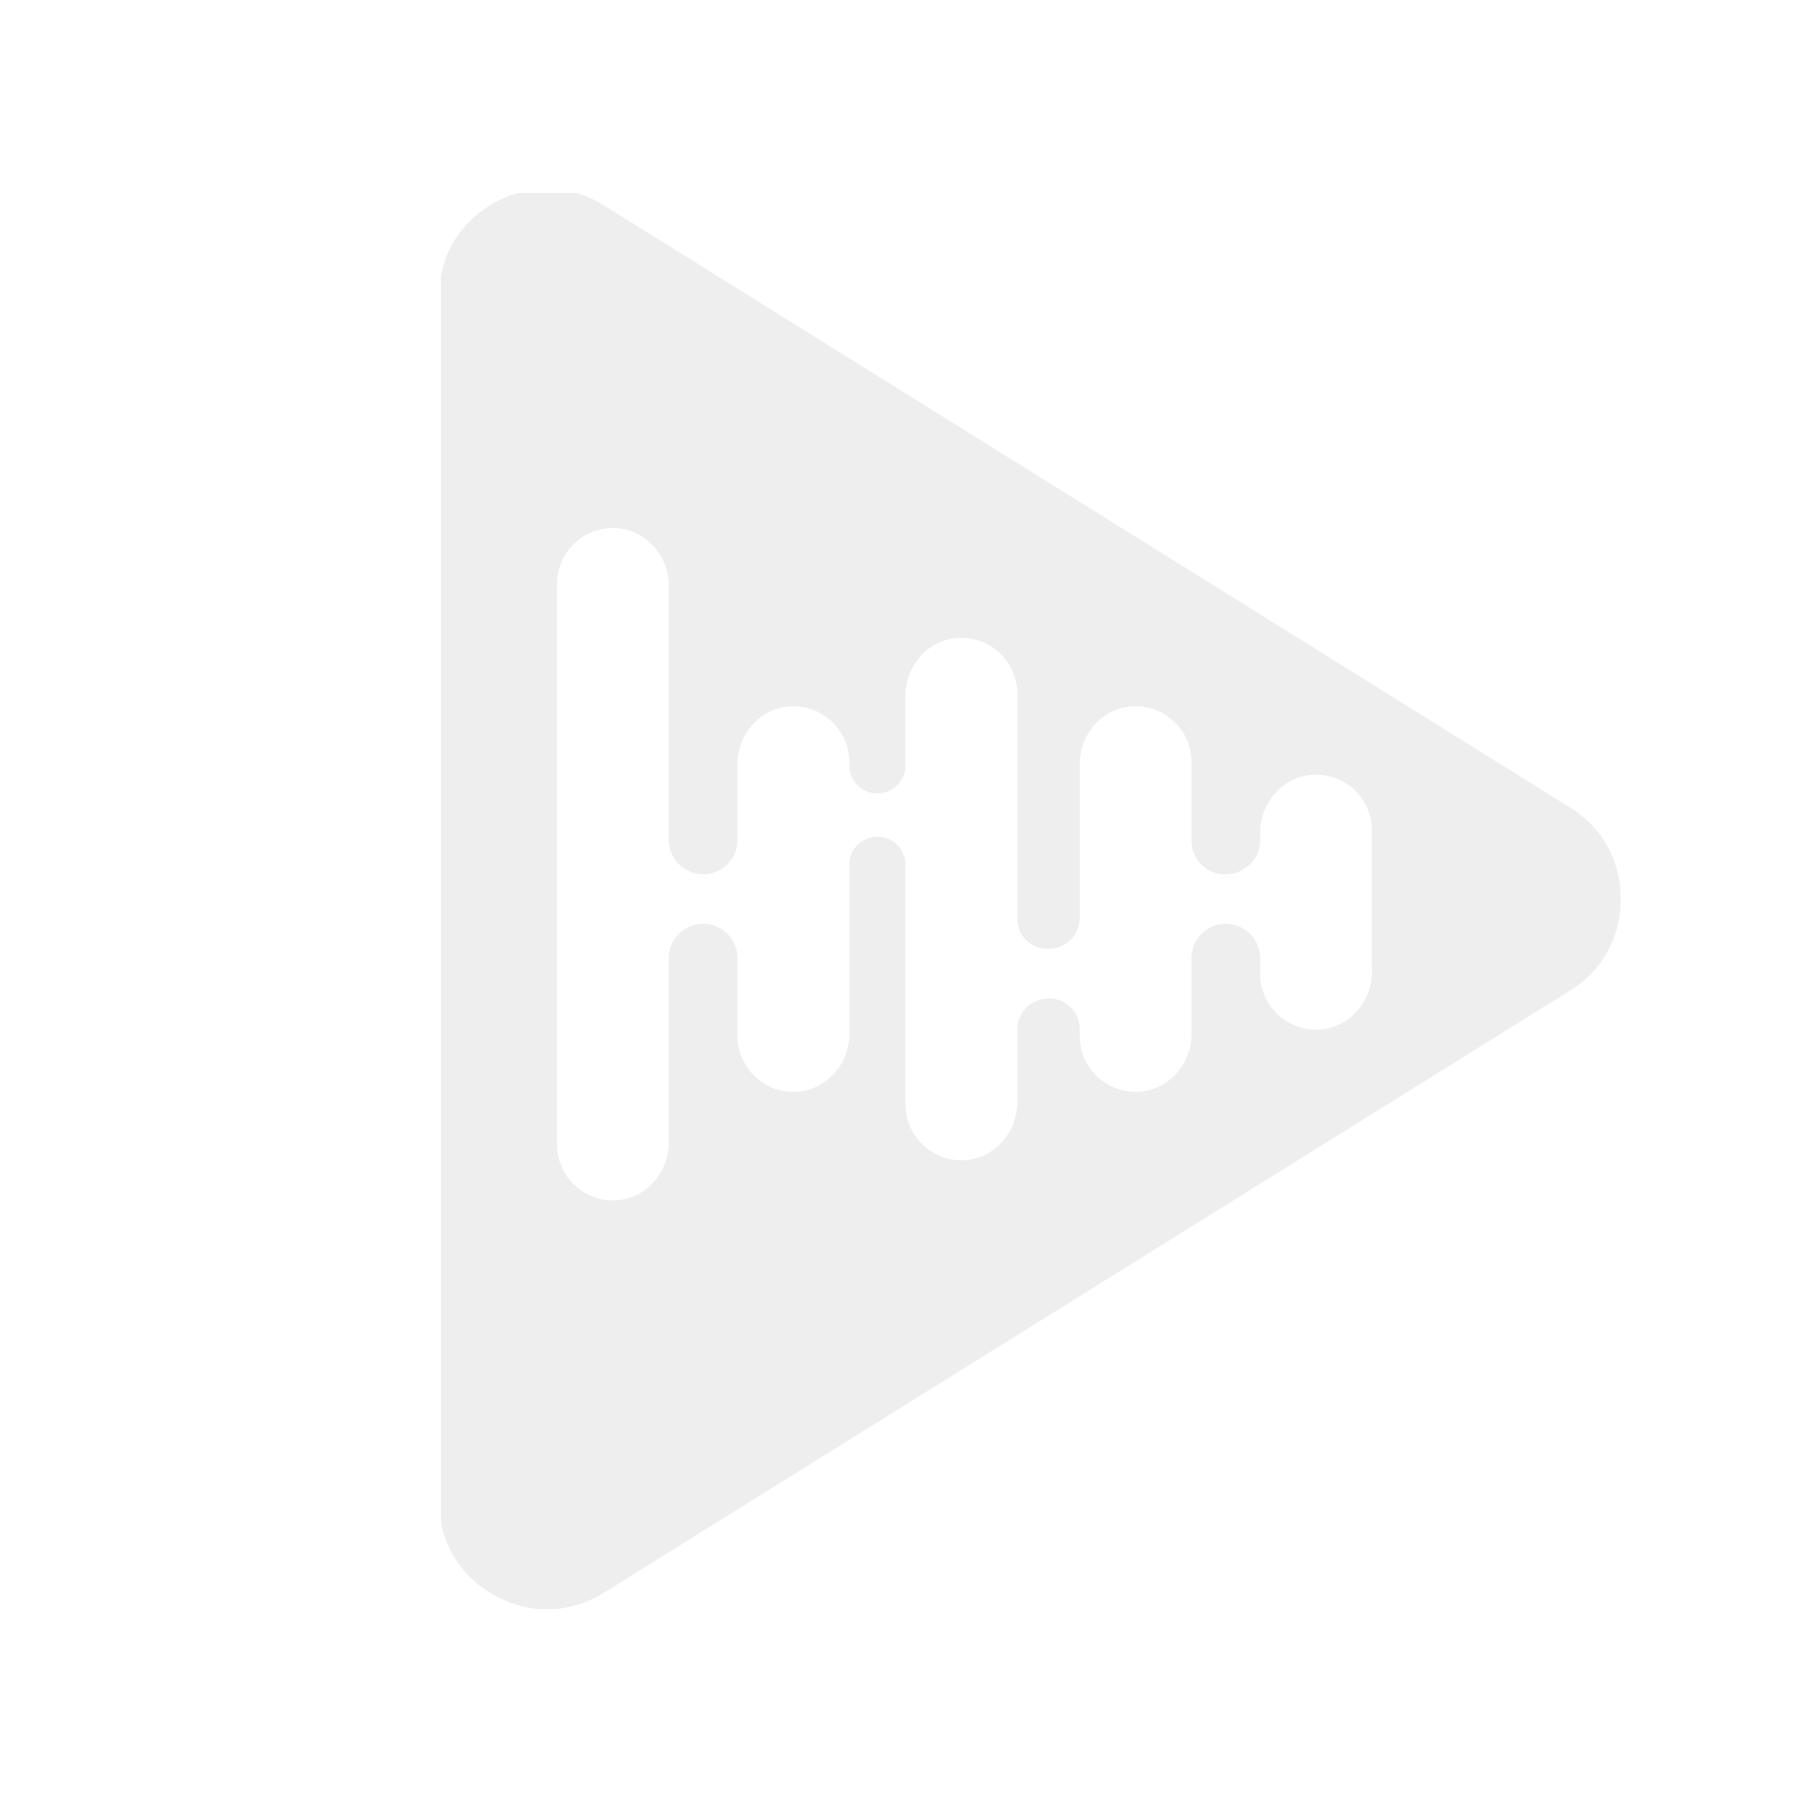 Speedsignal B-3450276